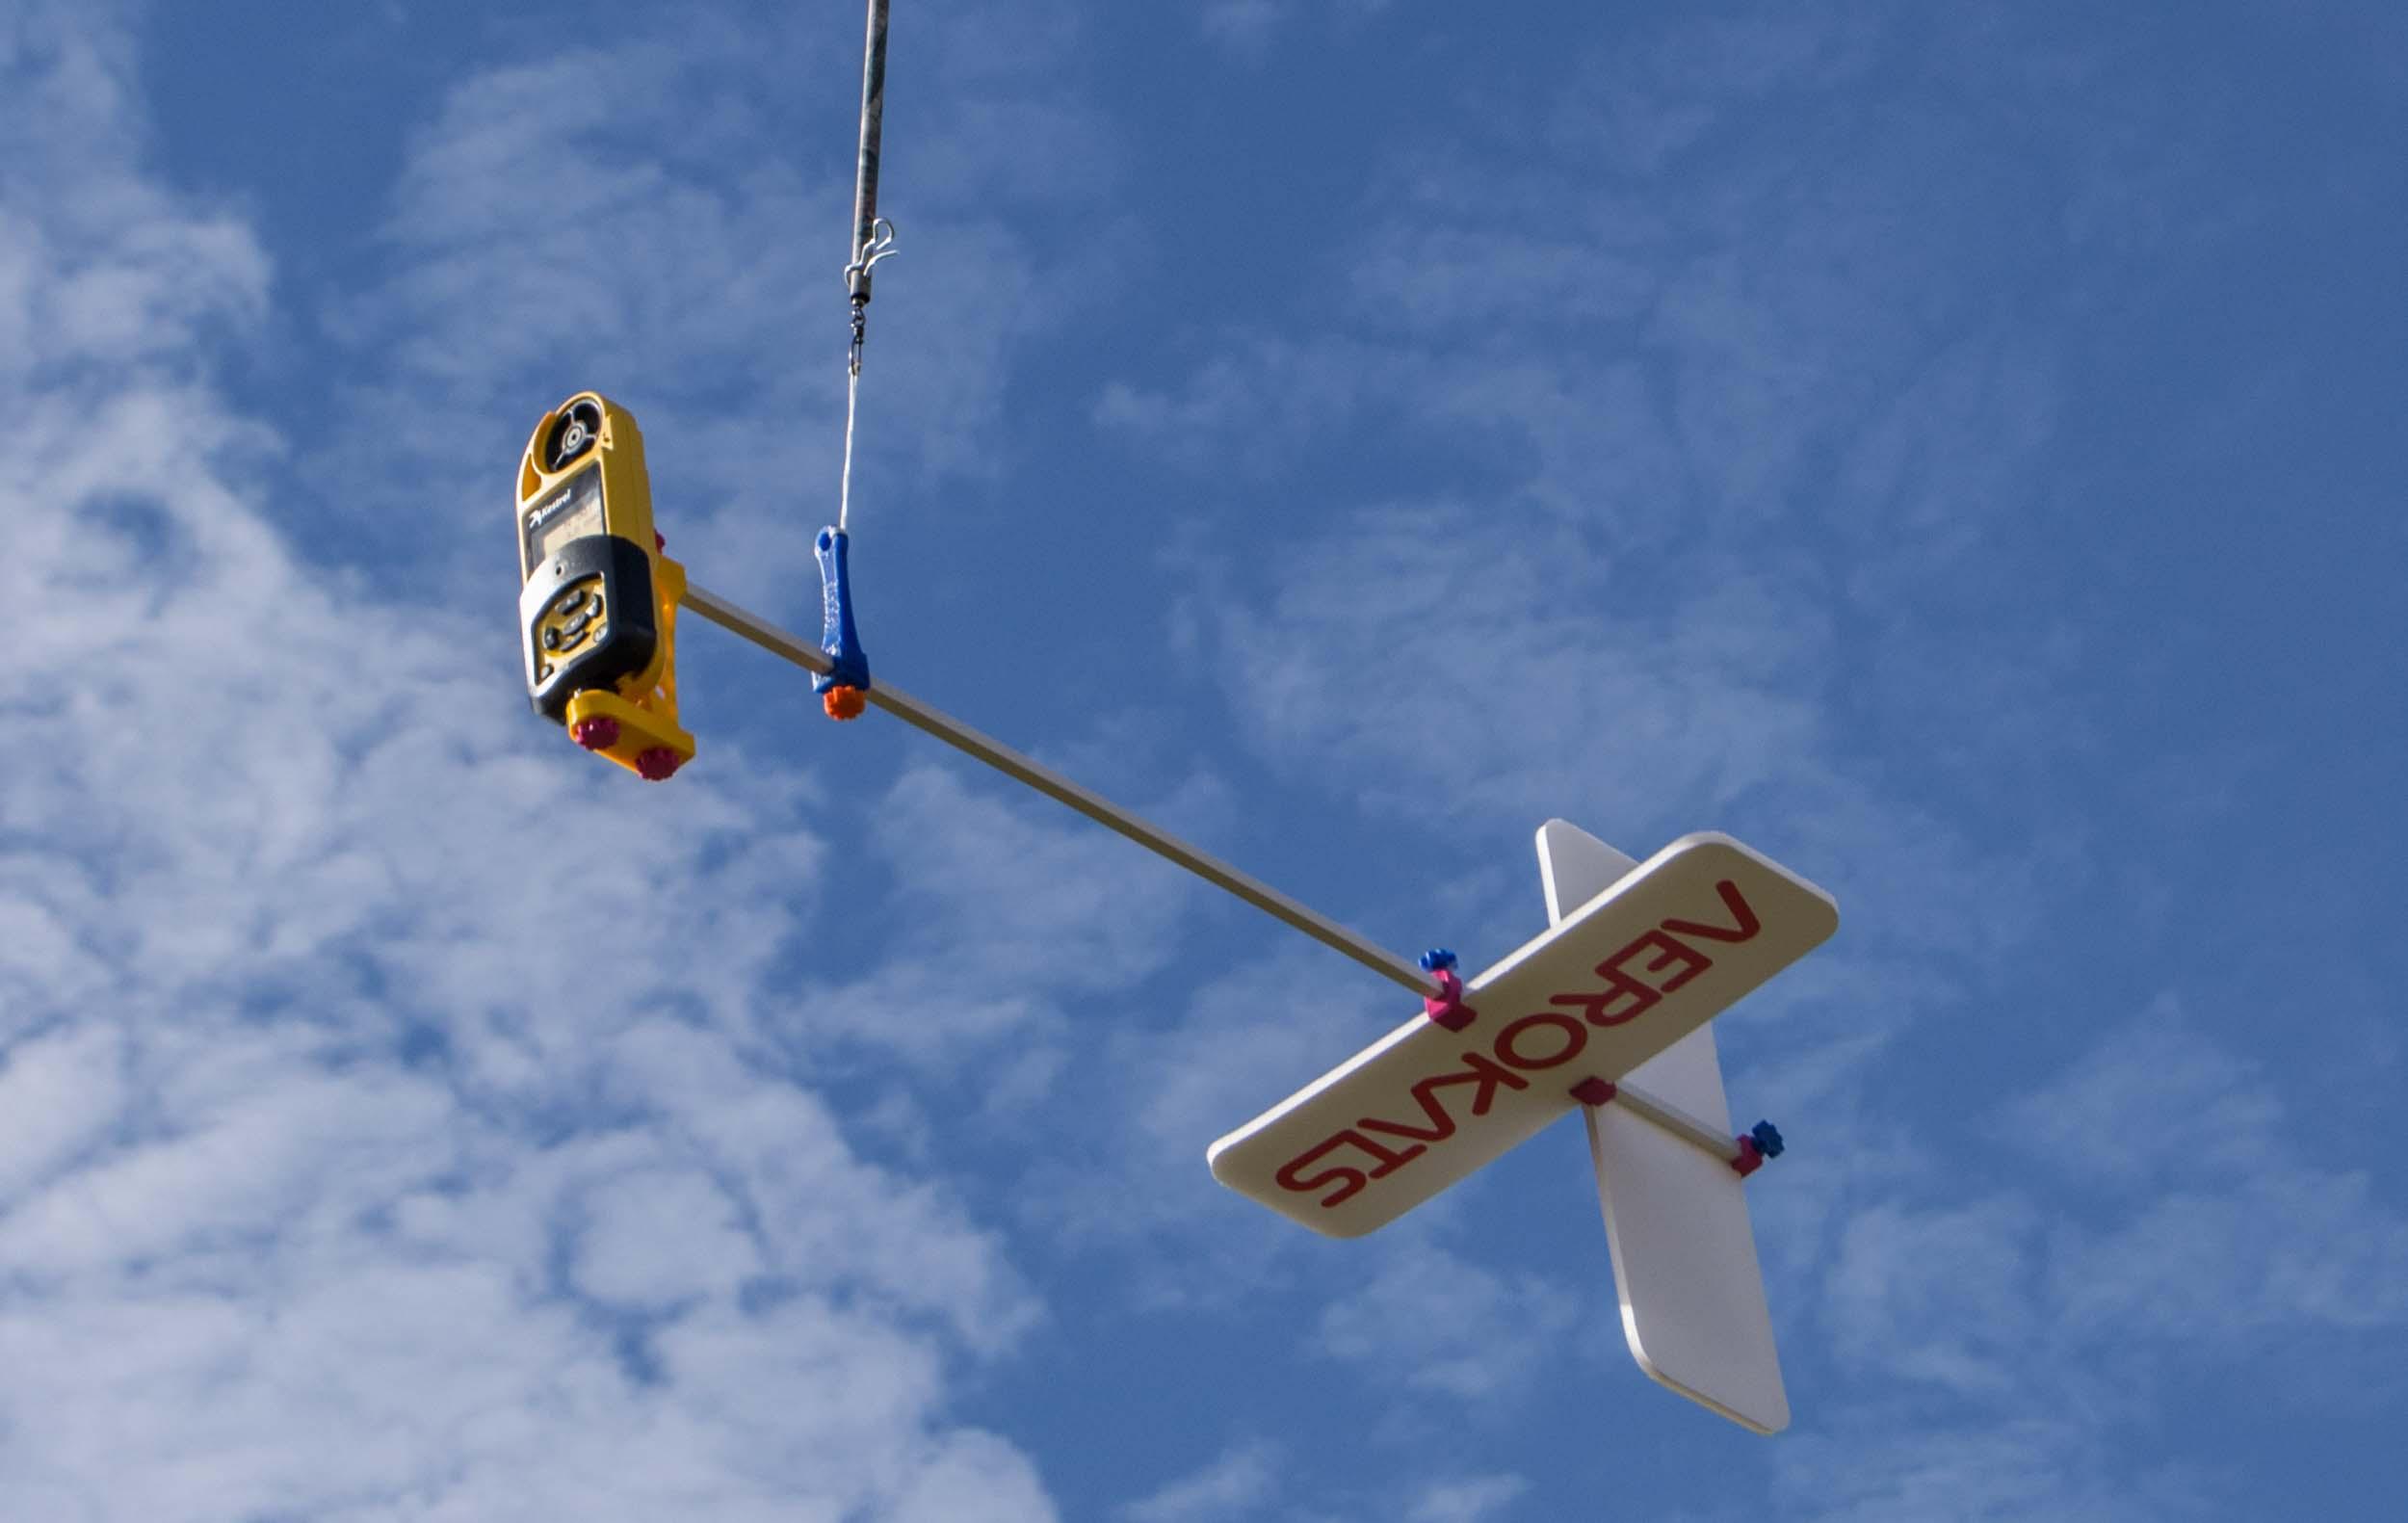 🎈 Public Lab: Winds aloft: sensor overload